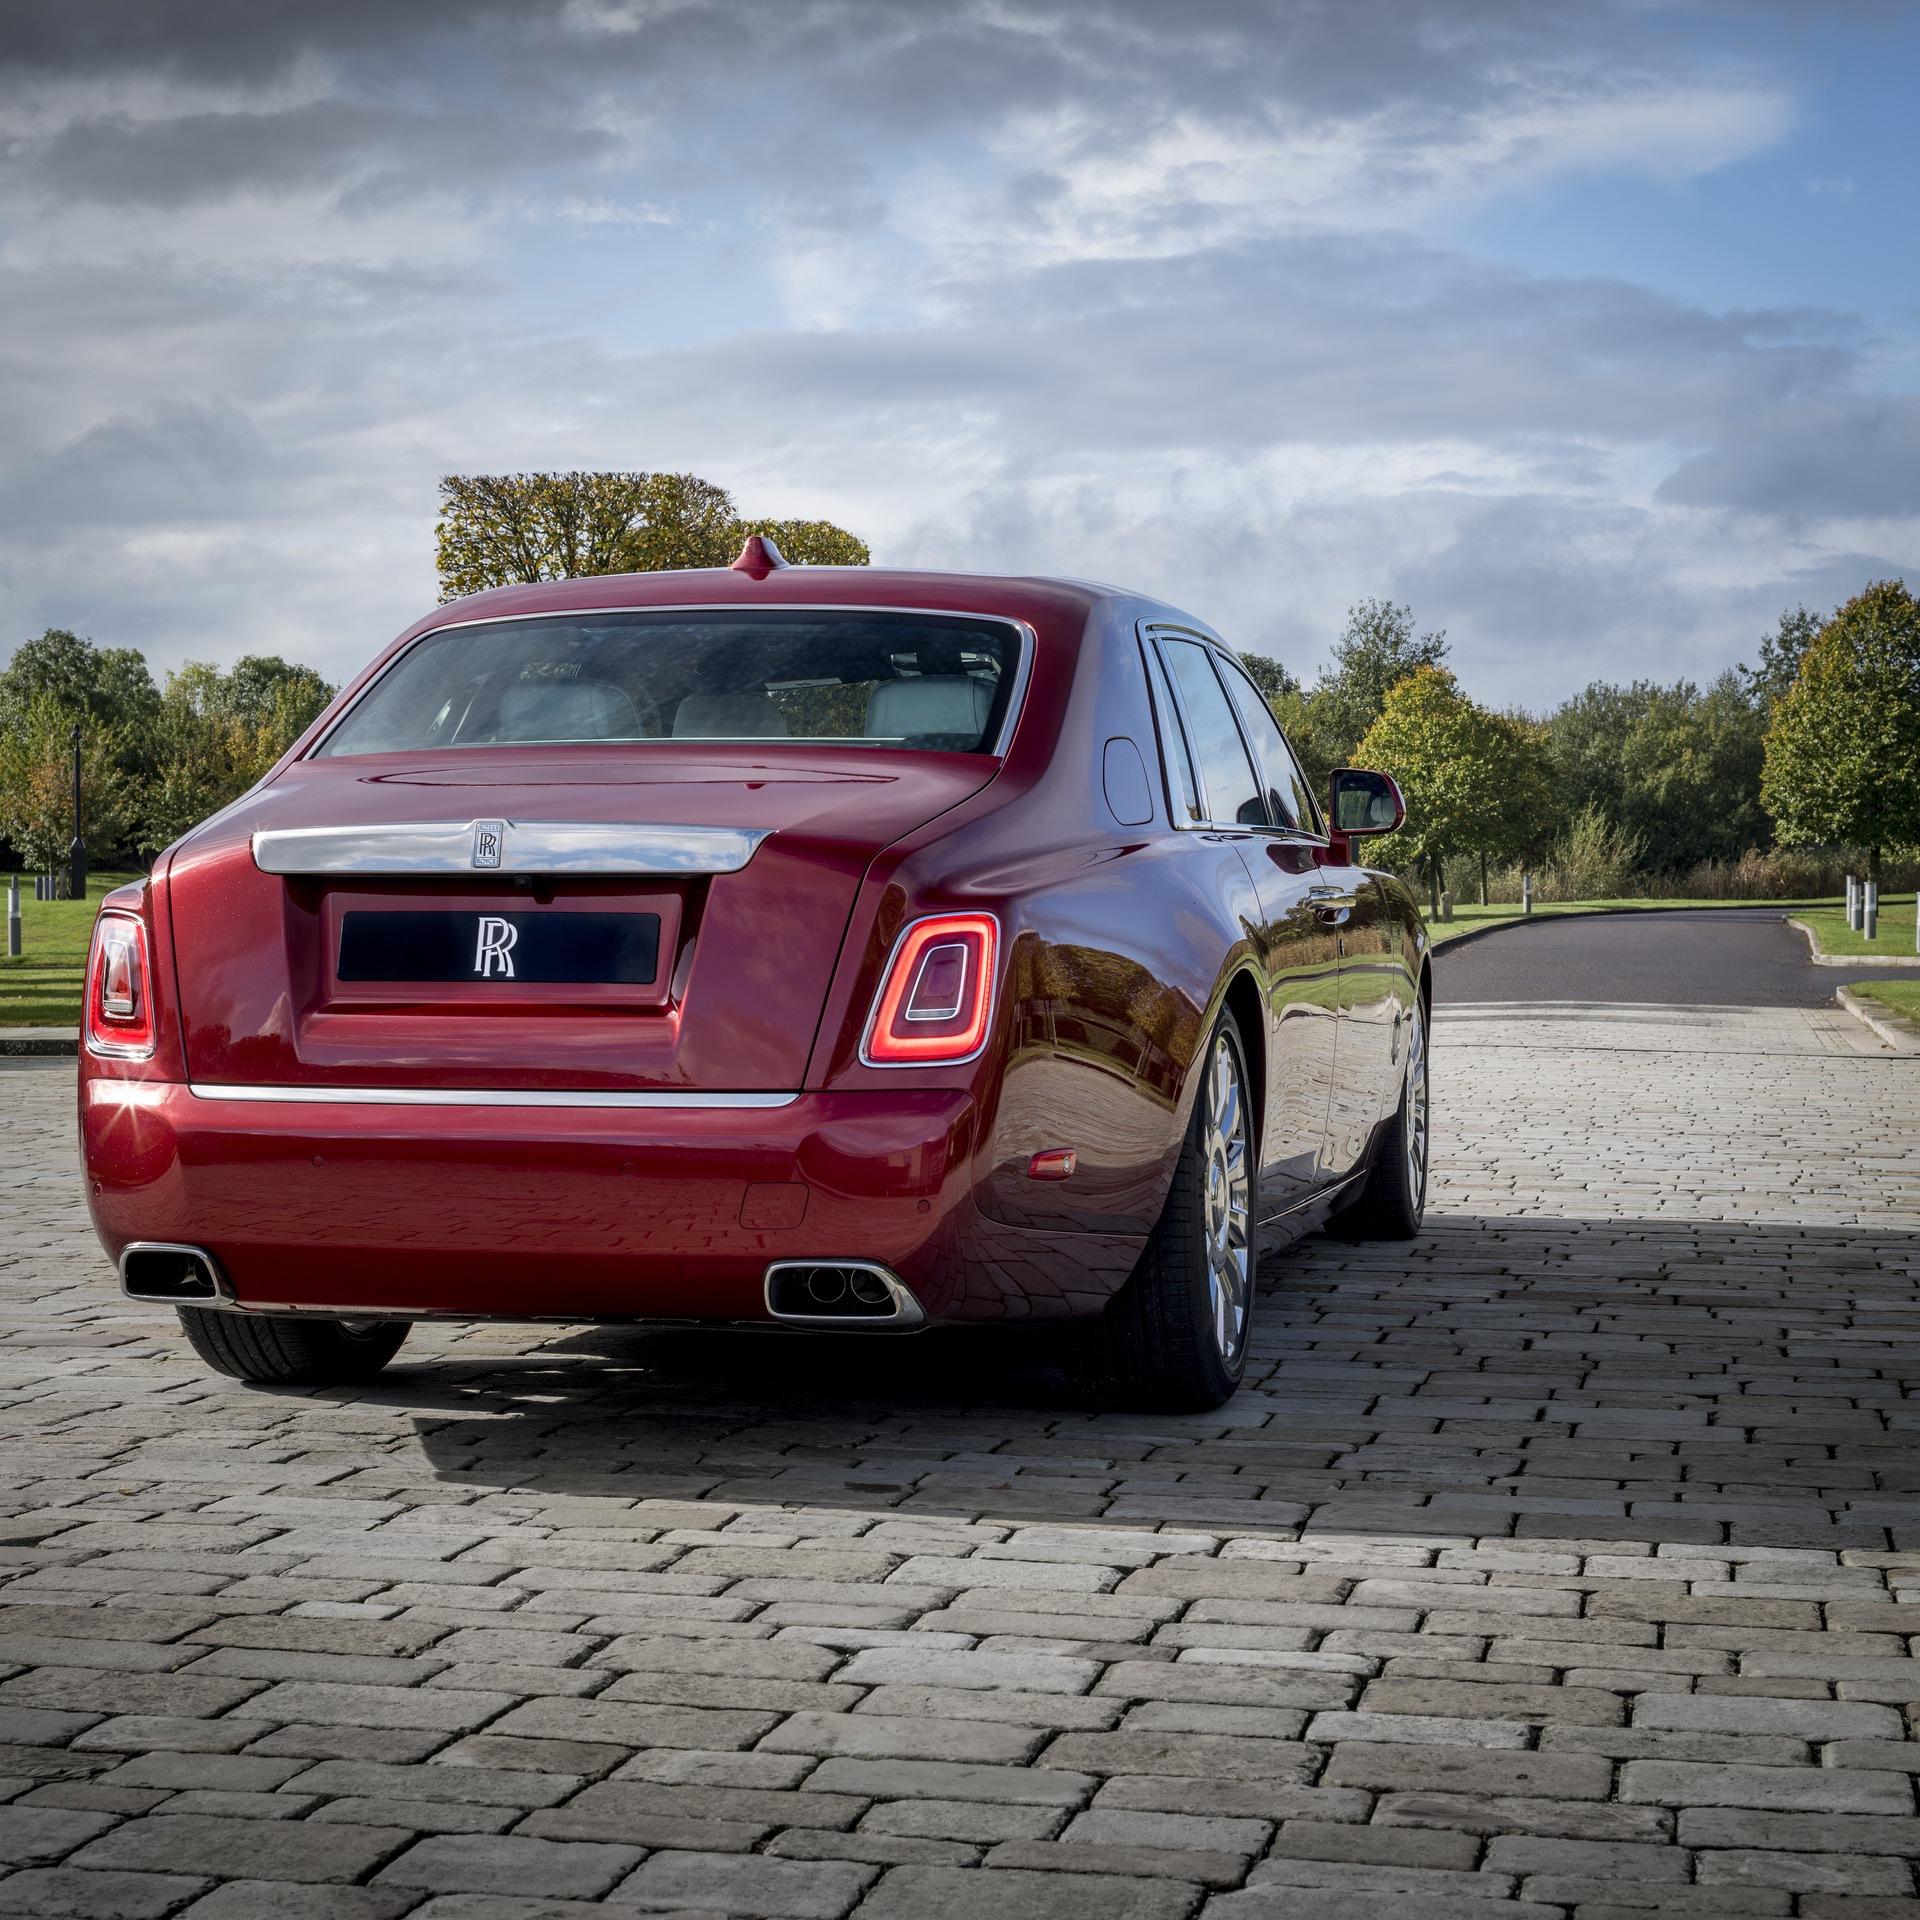 Rolls-Royce_Red_Phantom_0010